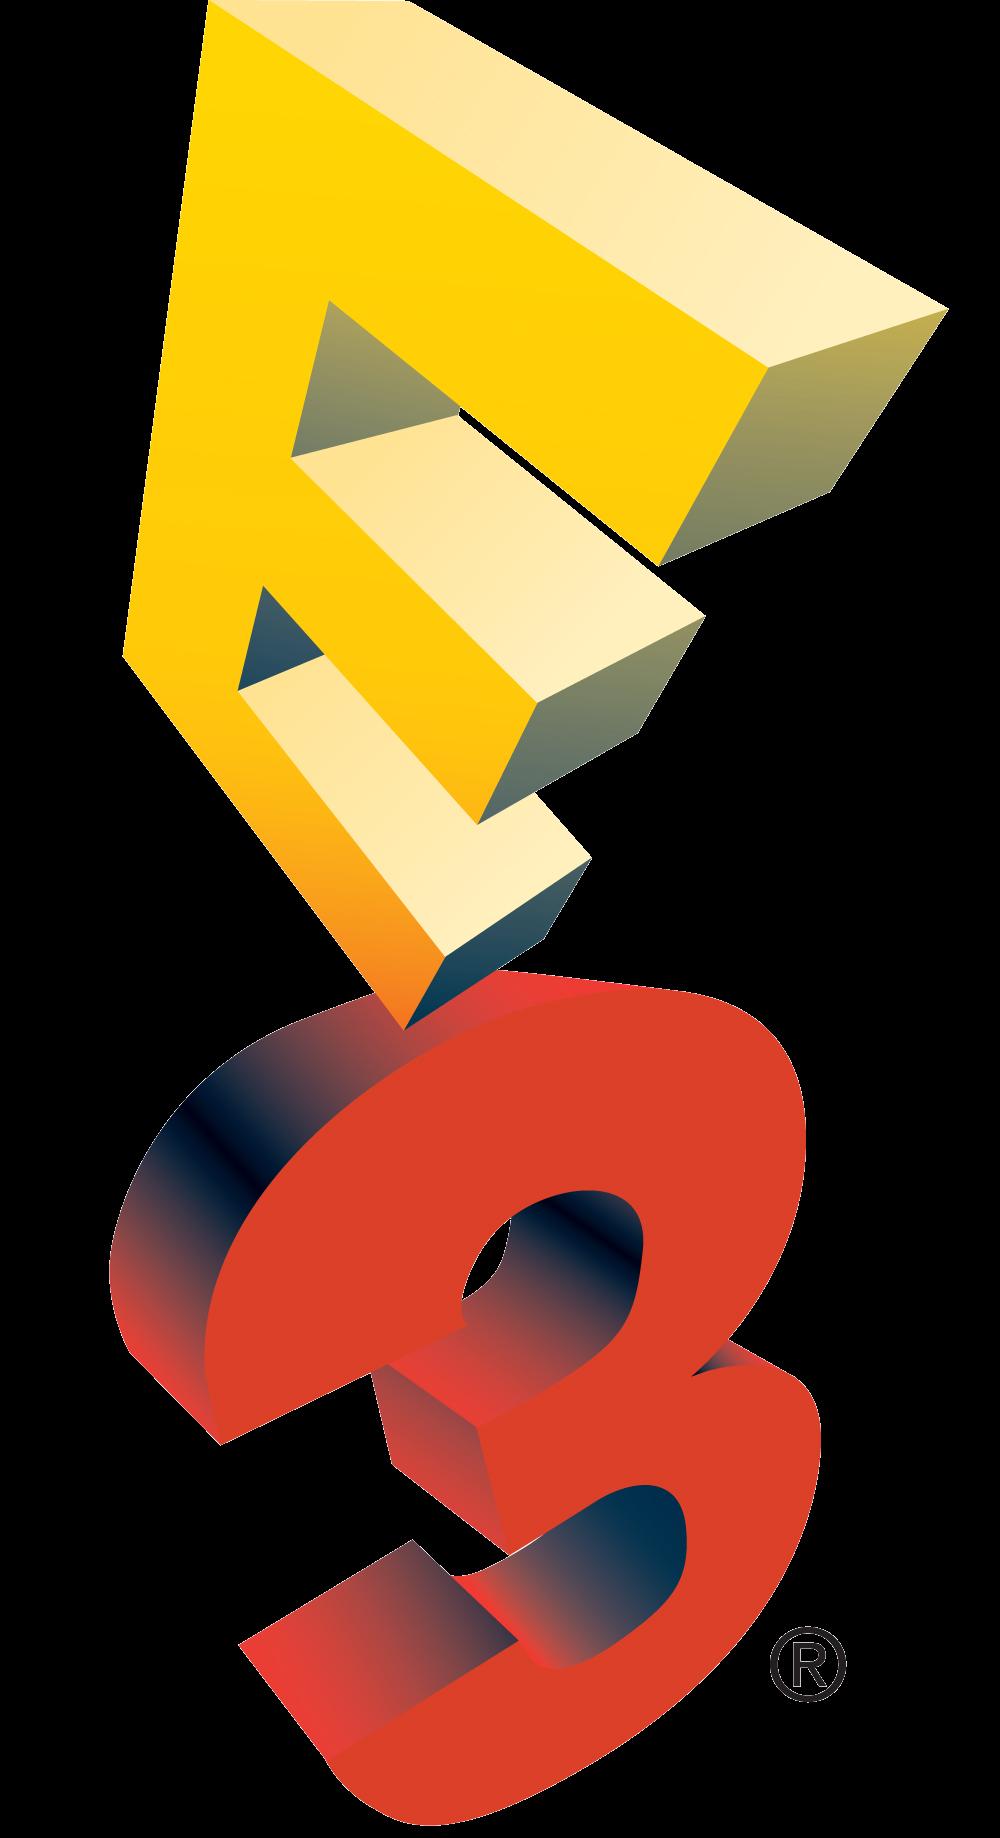 E3 finally gets a new logo - Polygon